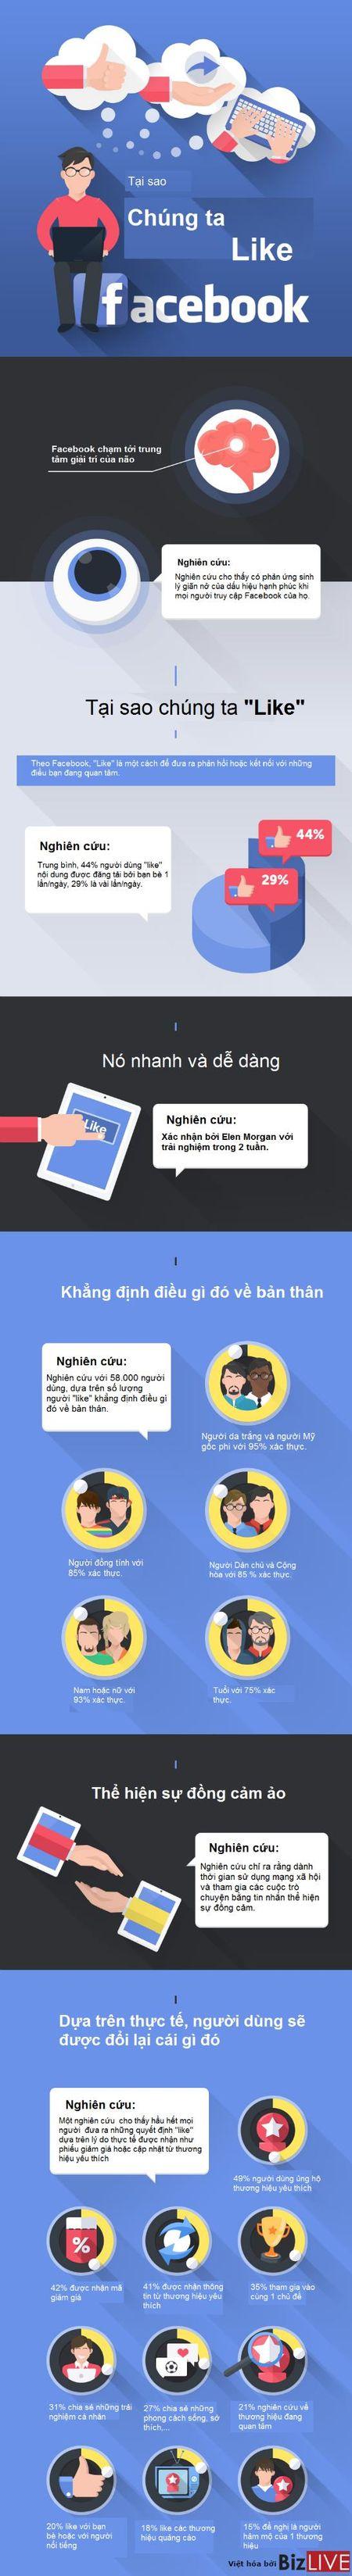 Tai sao chung ta 'like' Facebook? - Anh 2